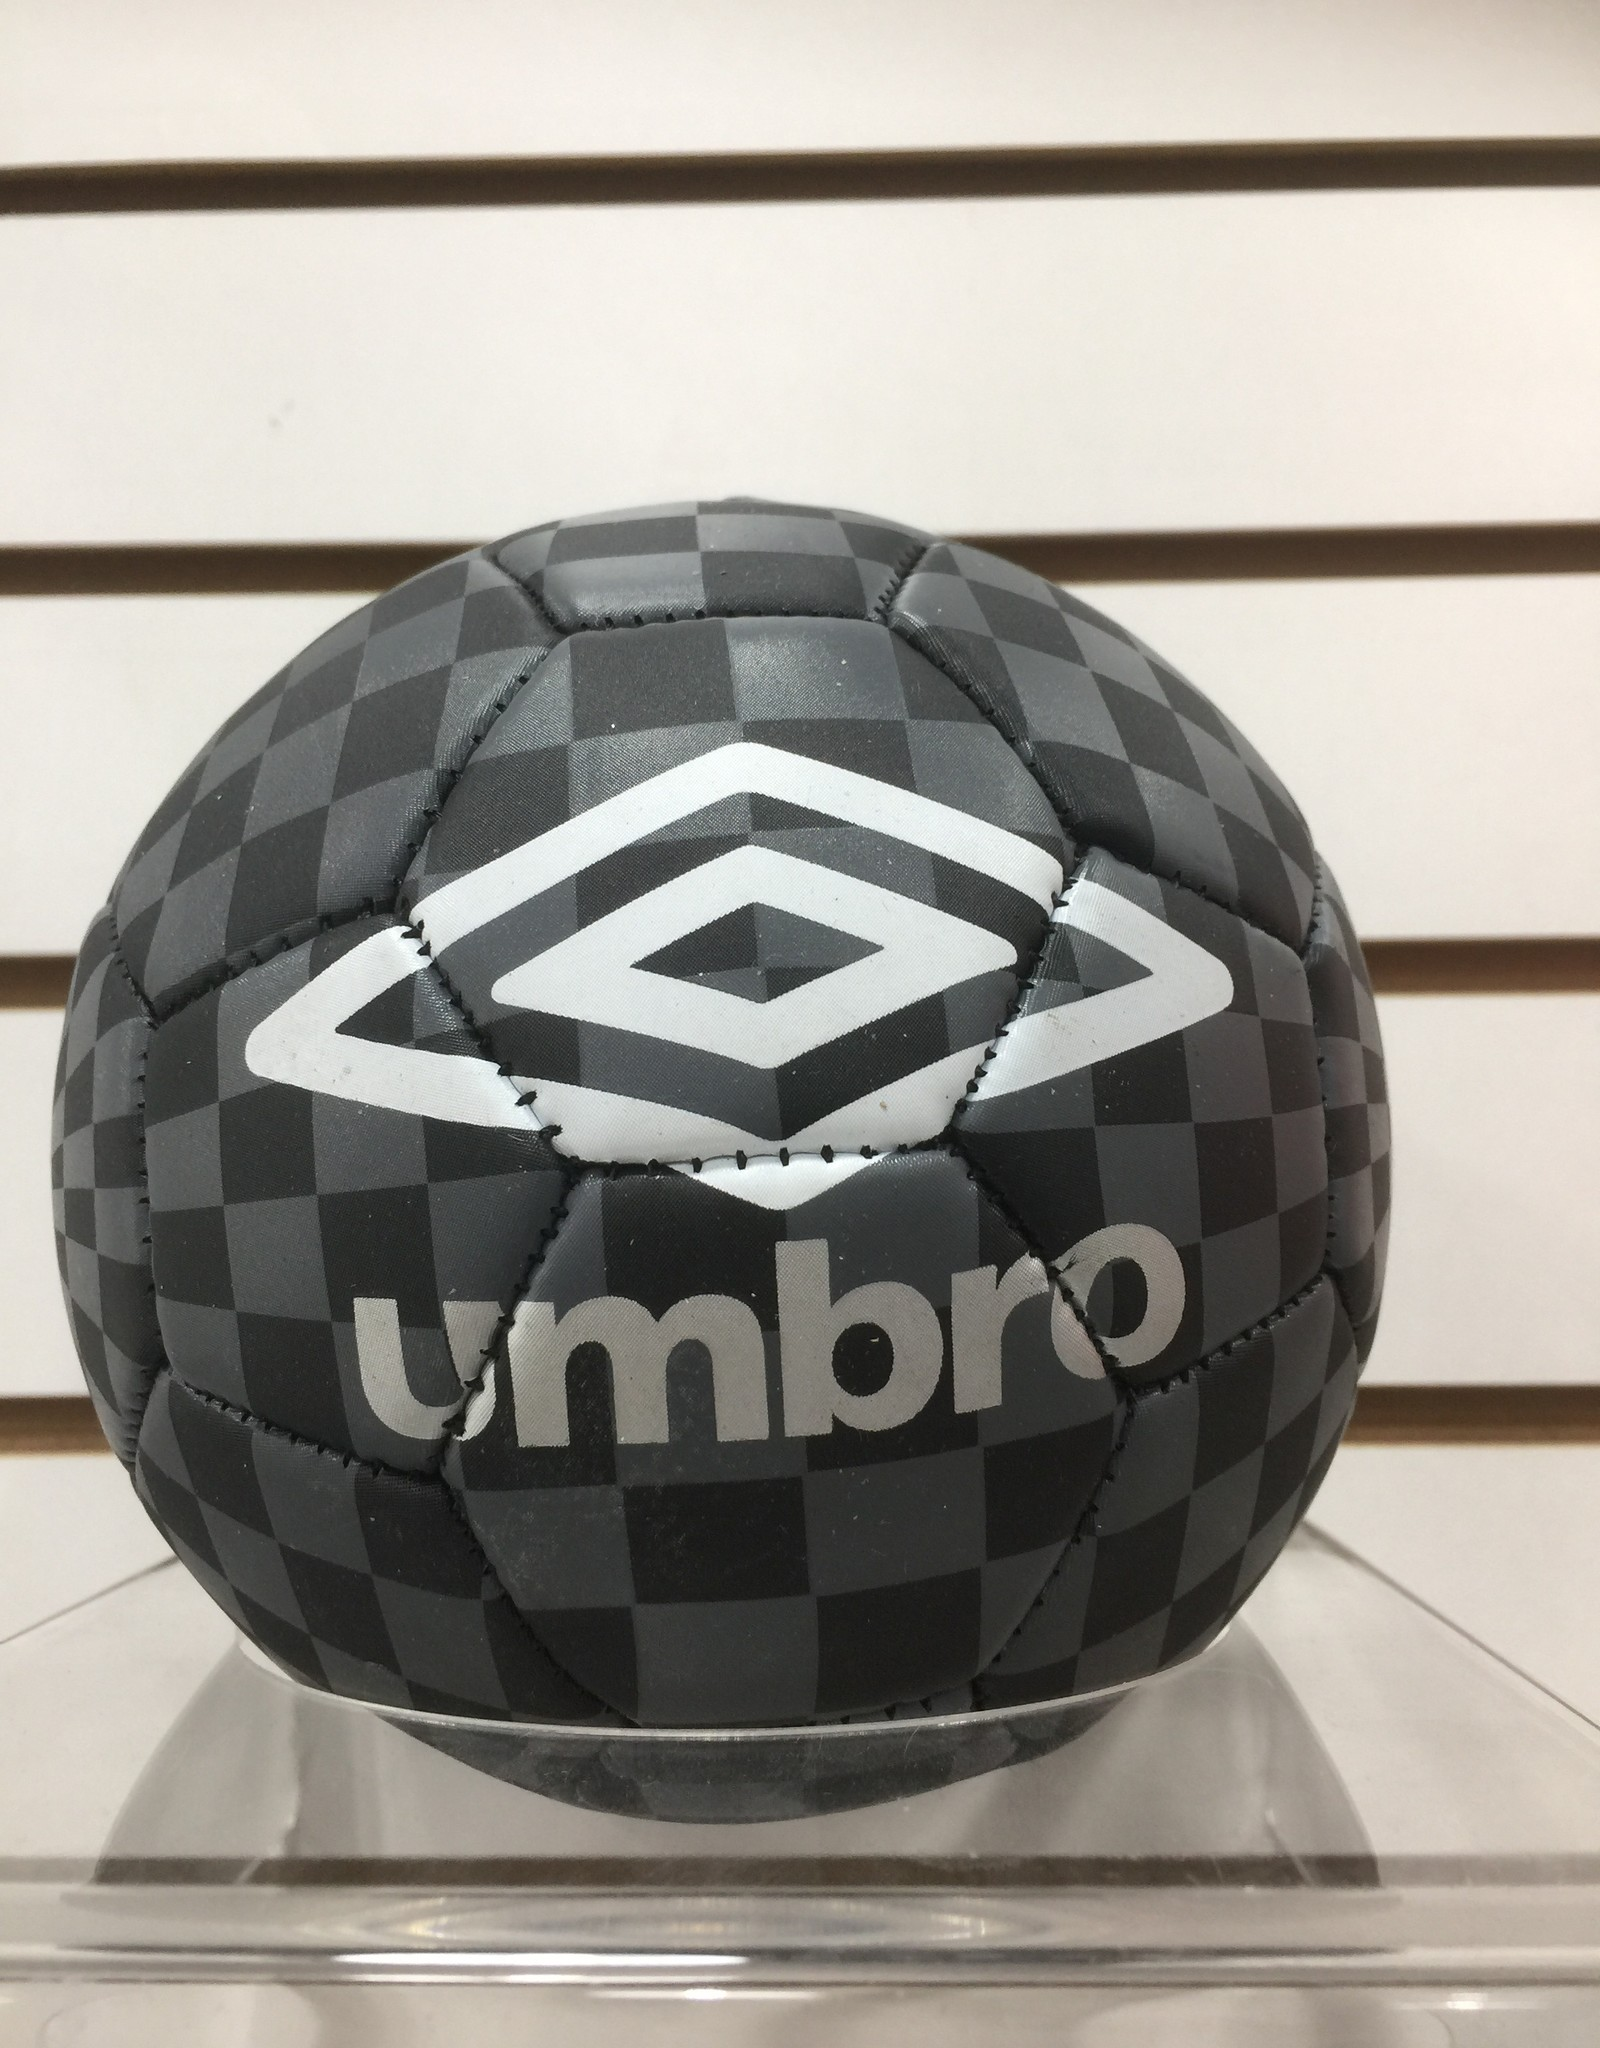 Umbro Umbro minor soccer ball